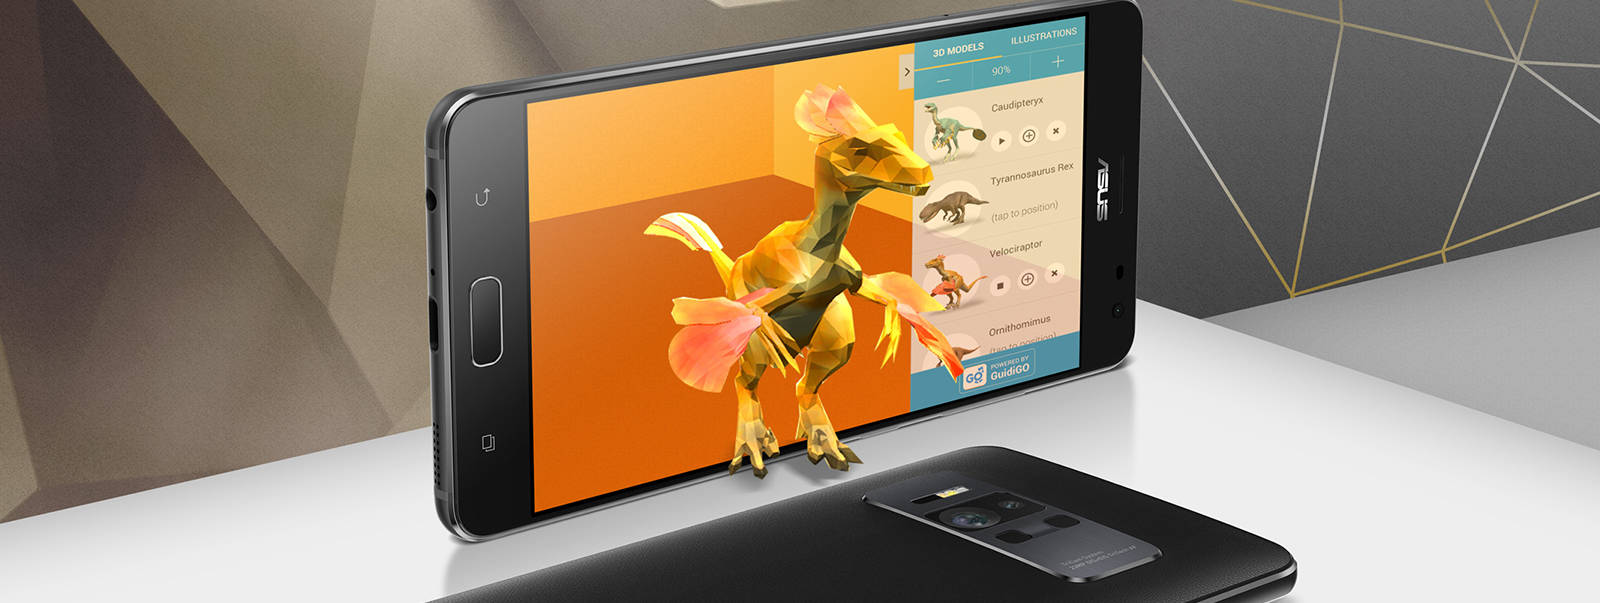 смартфон Asus Zenfone AR обзор